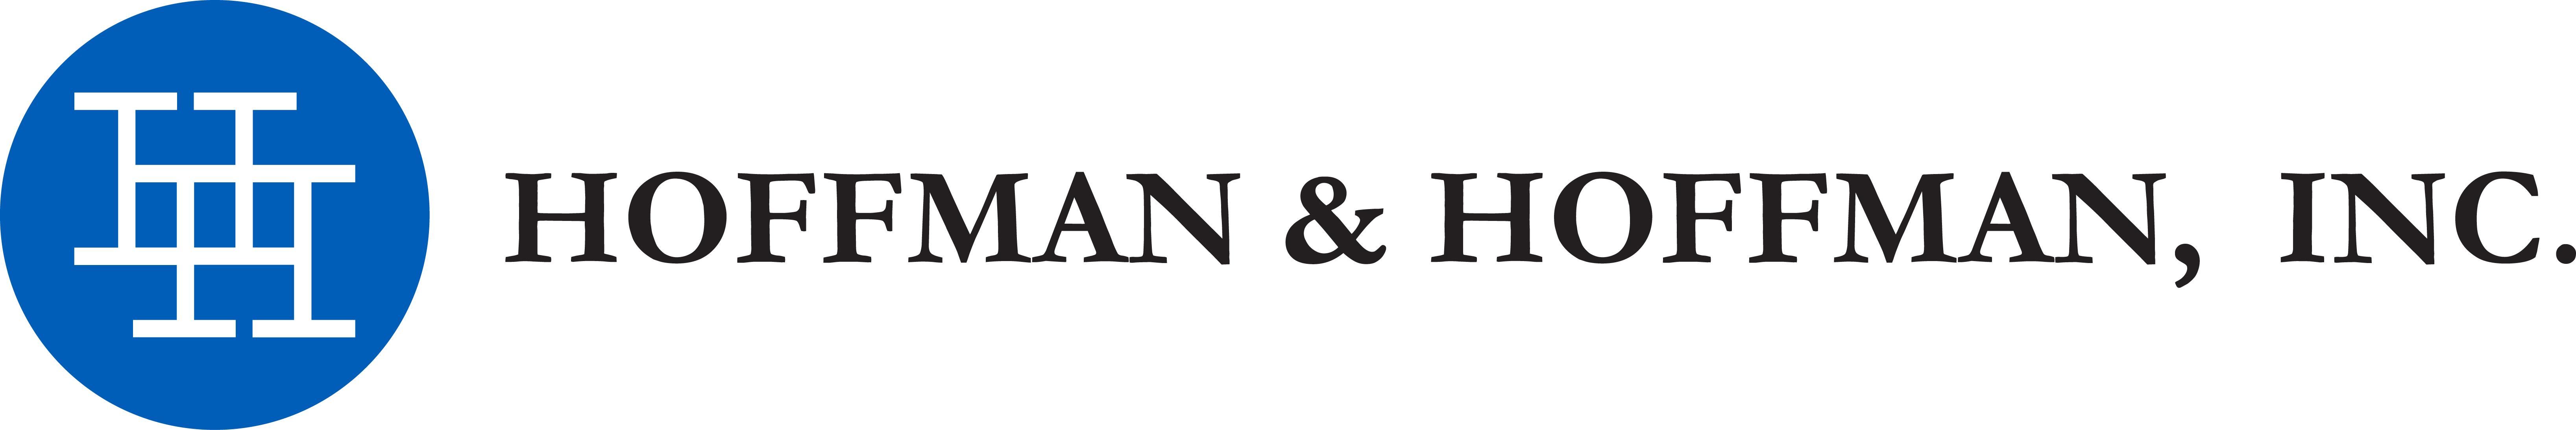 Hoffman & Hoffman